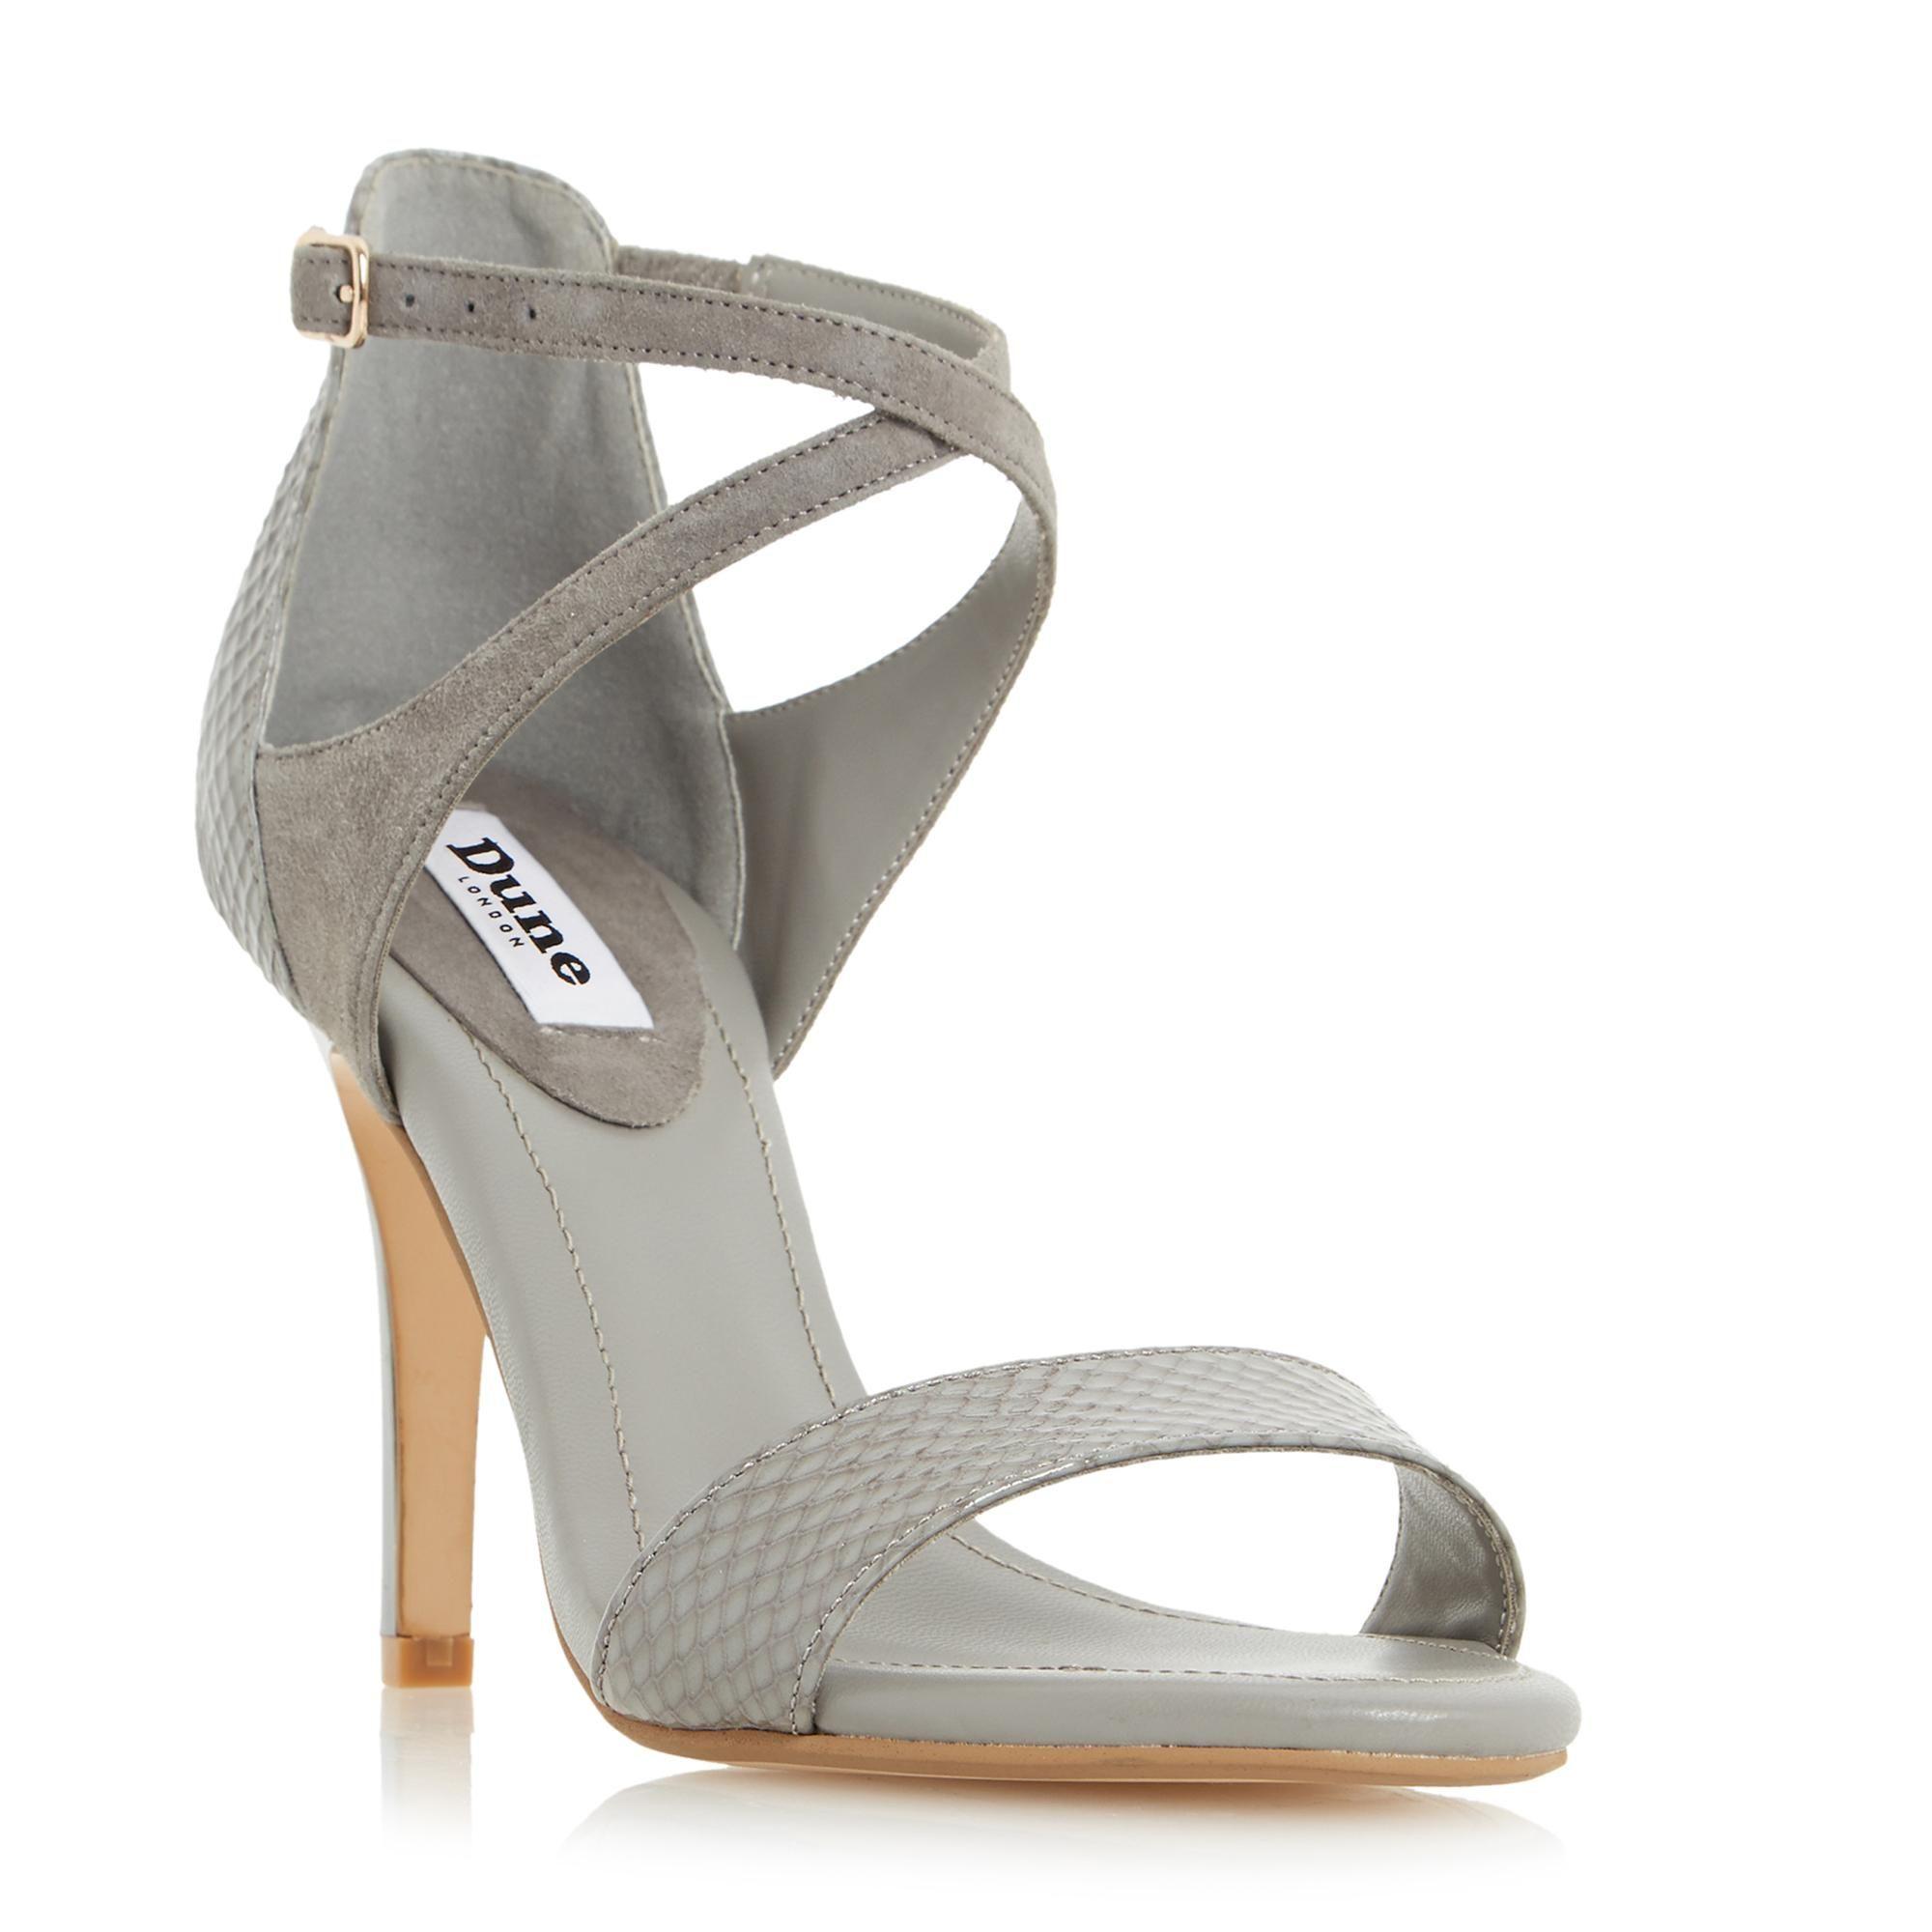 Dune La s MADELEINE Strappy Cross Strap Heeled Sandal in Grey